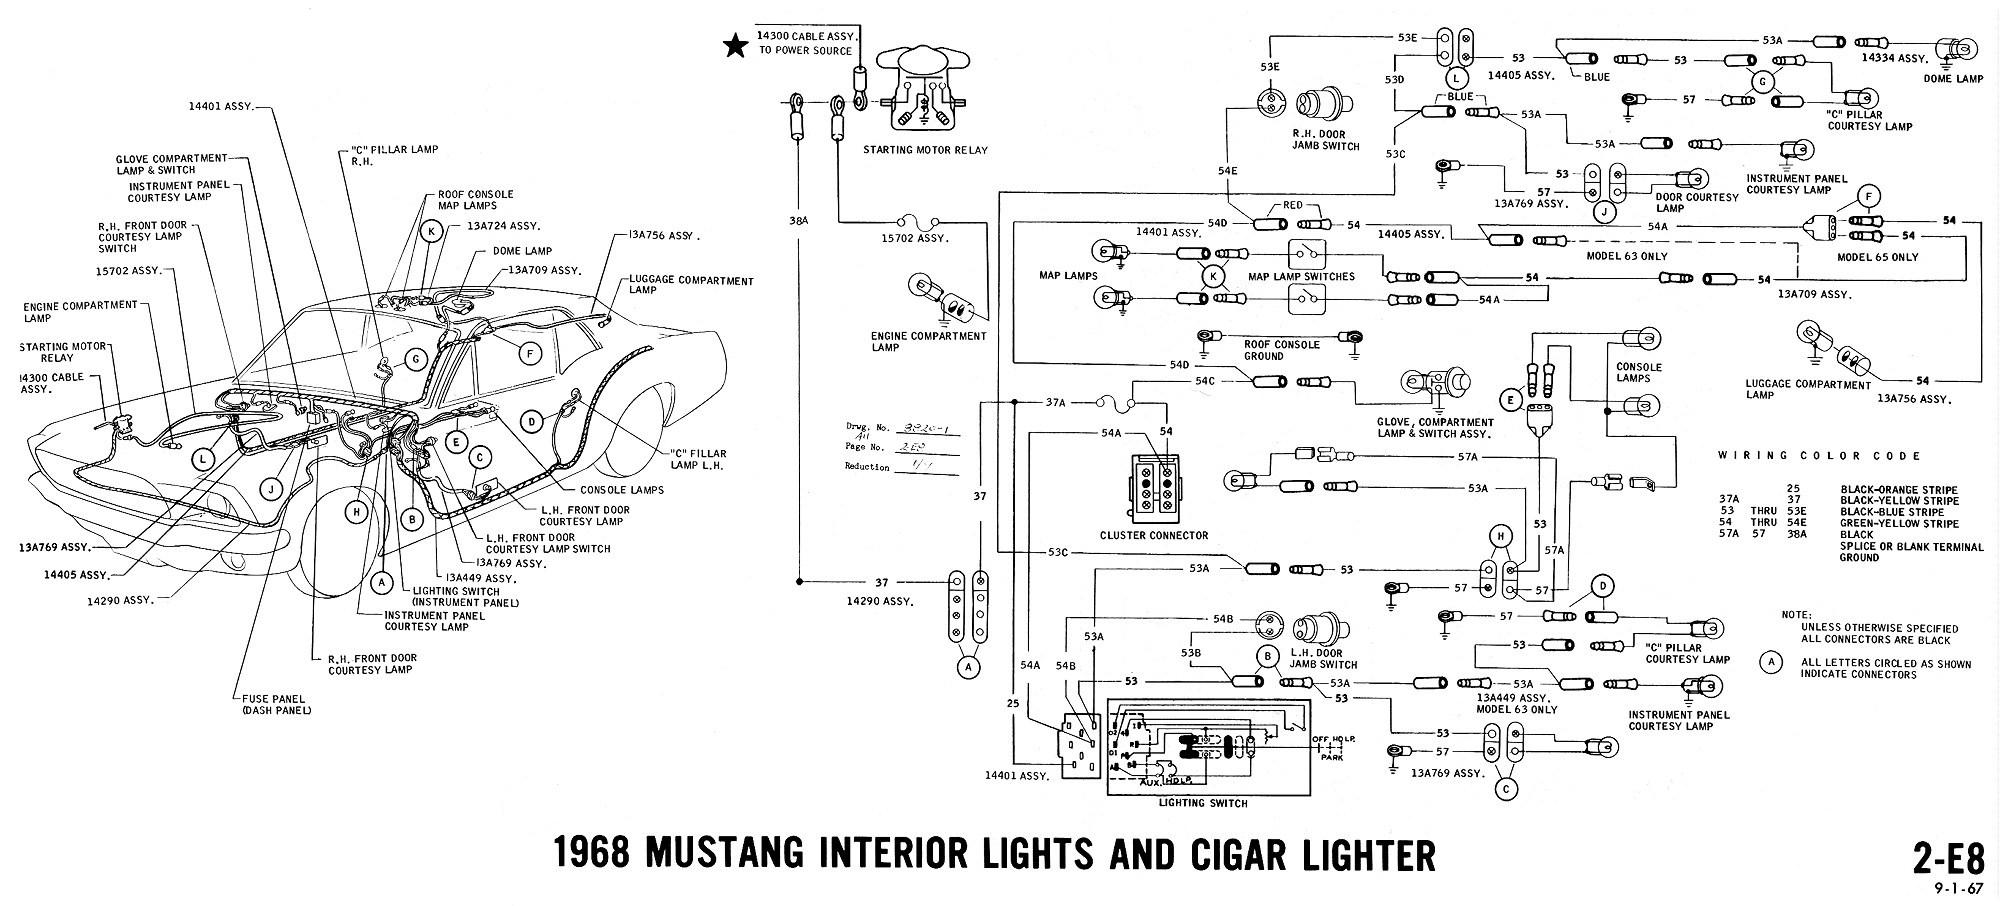 1967 Mustang Instrument Panel Wiring Diagram V4 Sti Wiring Diagram Bege Wiring Diagram